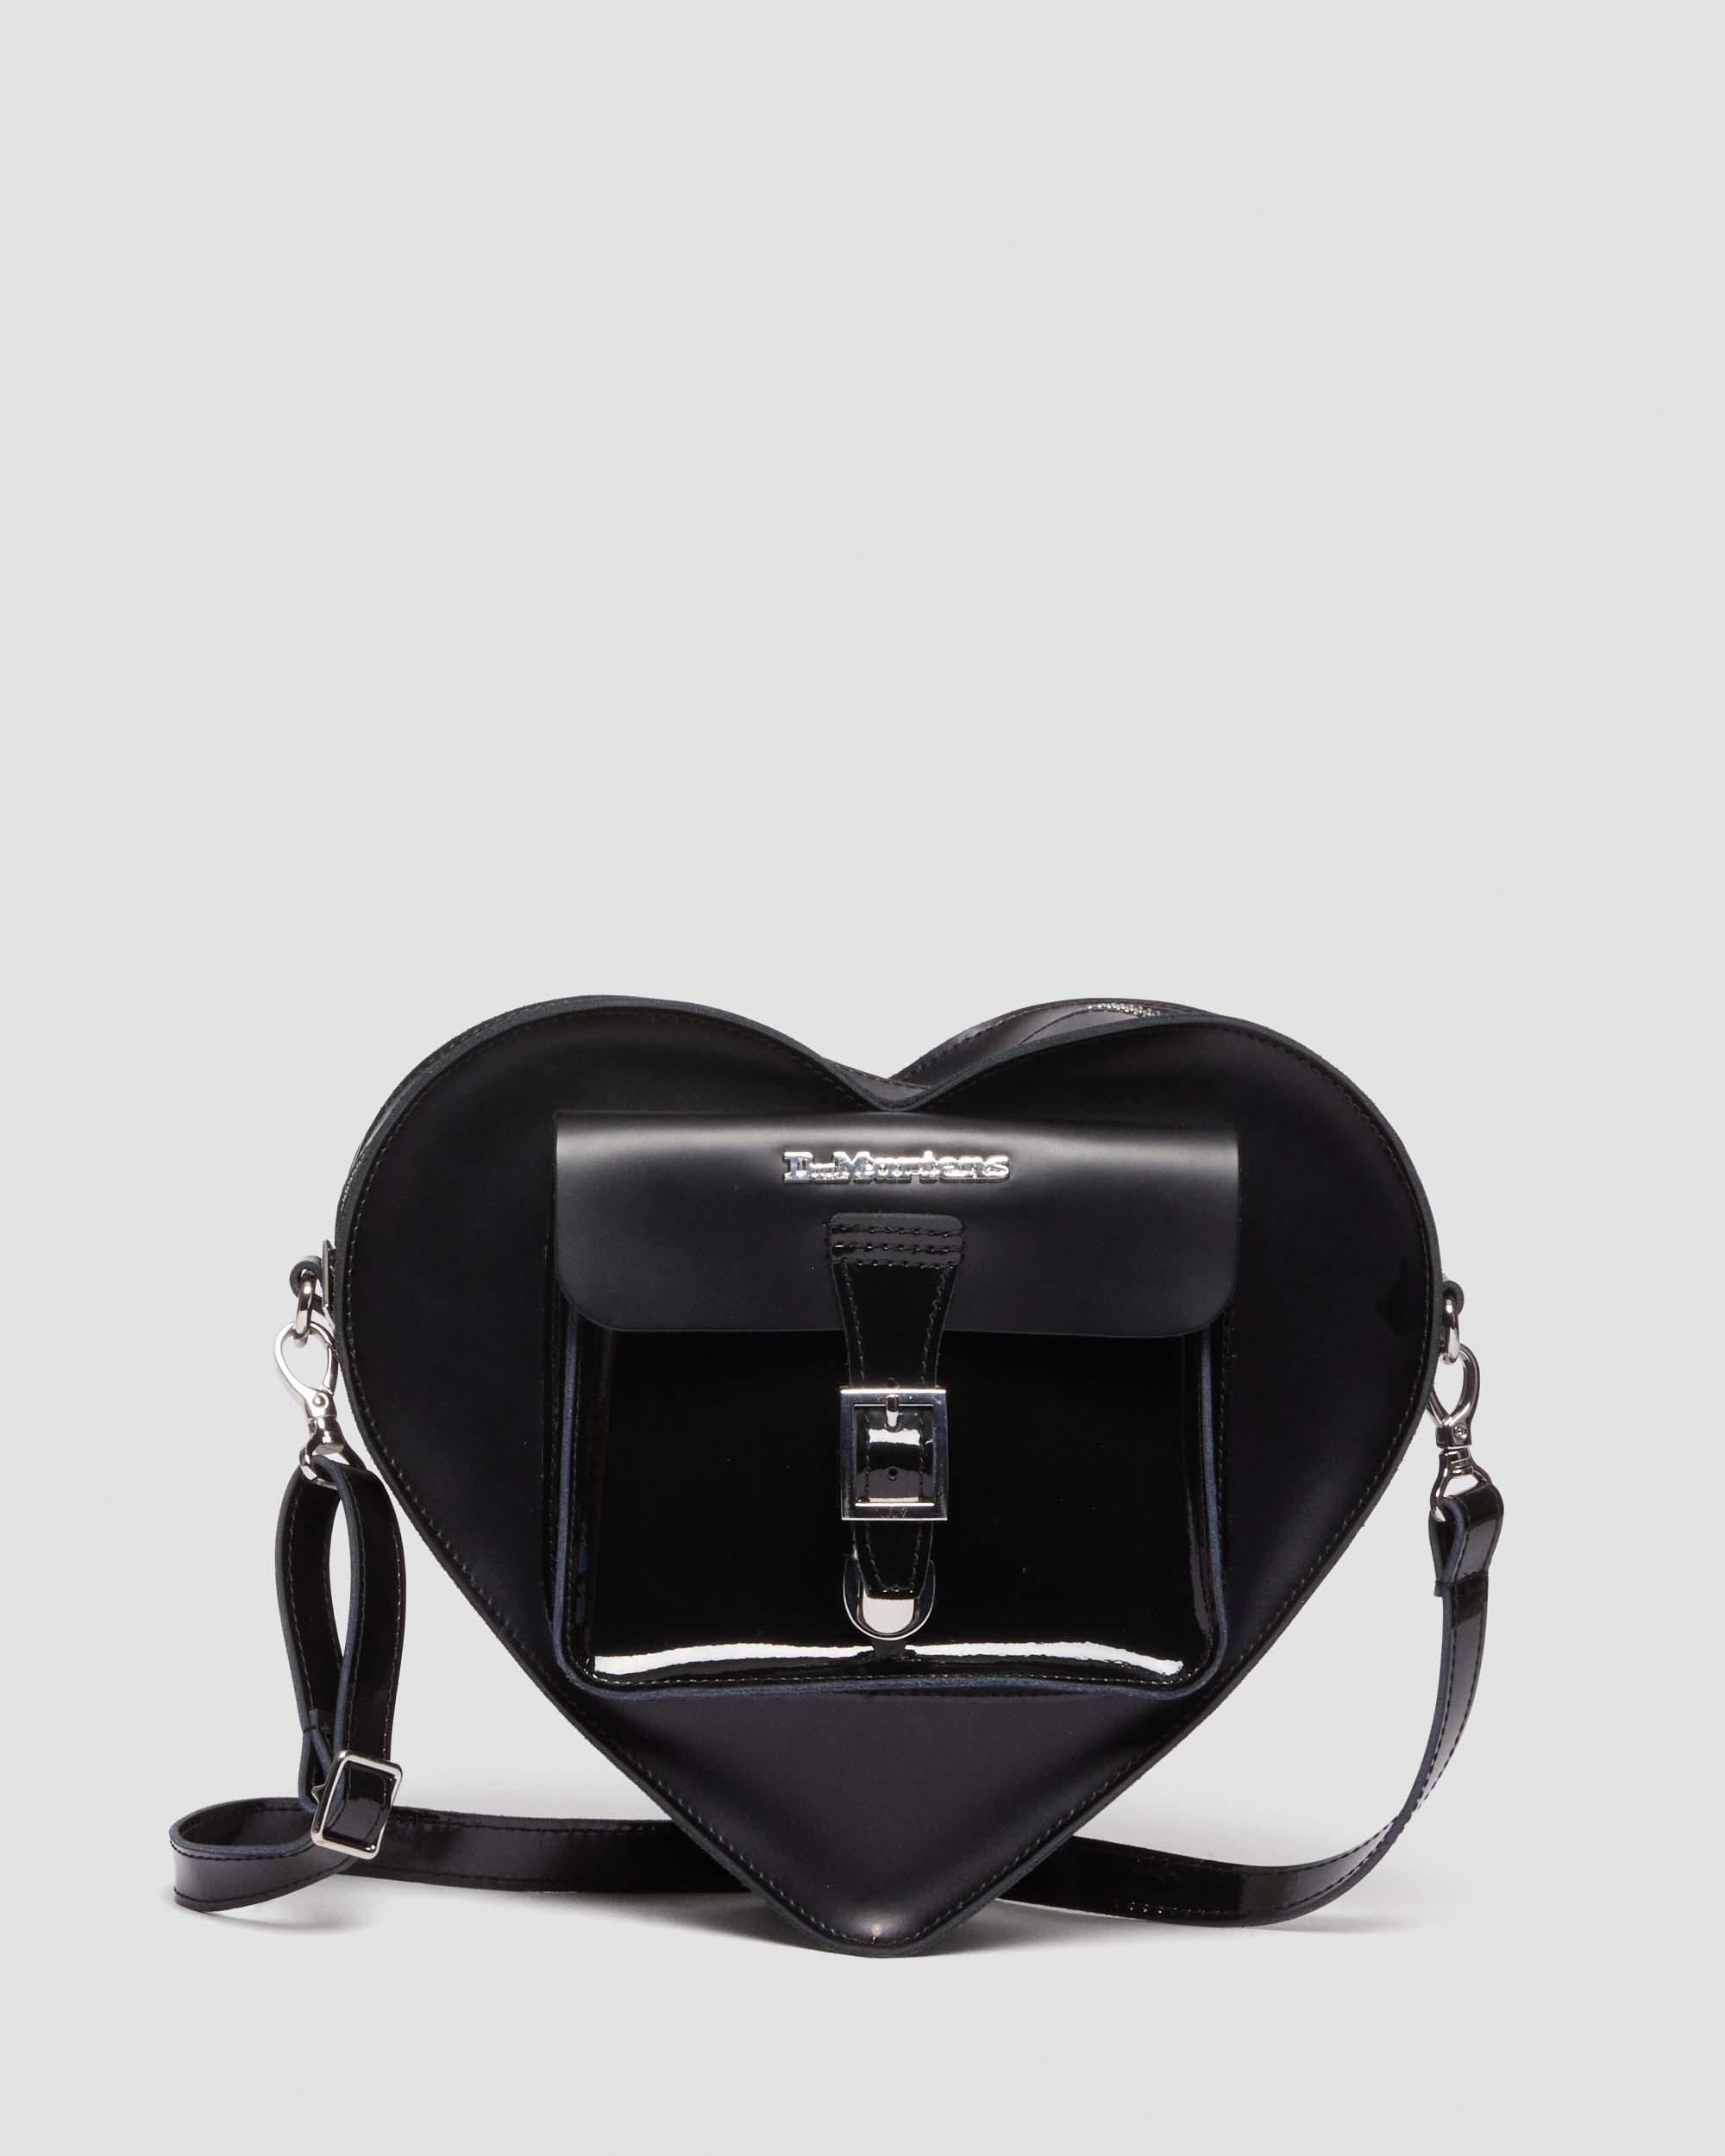 sac à main doc martens noir